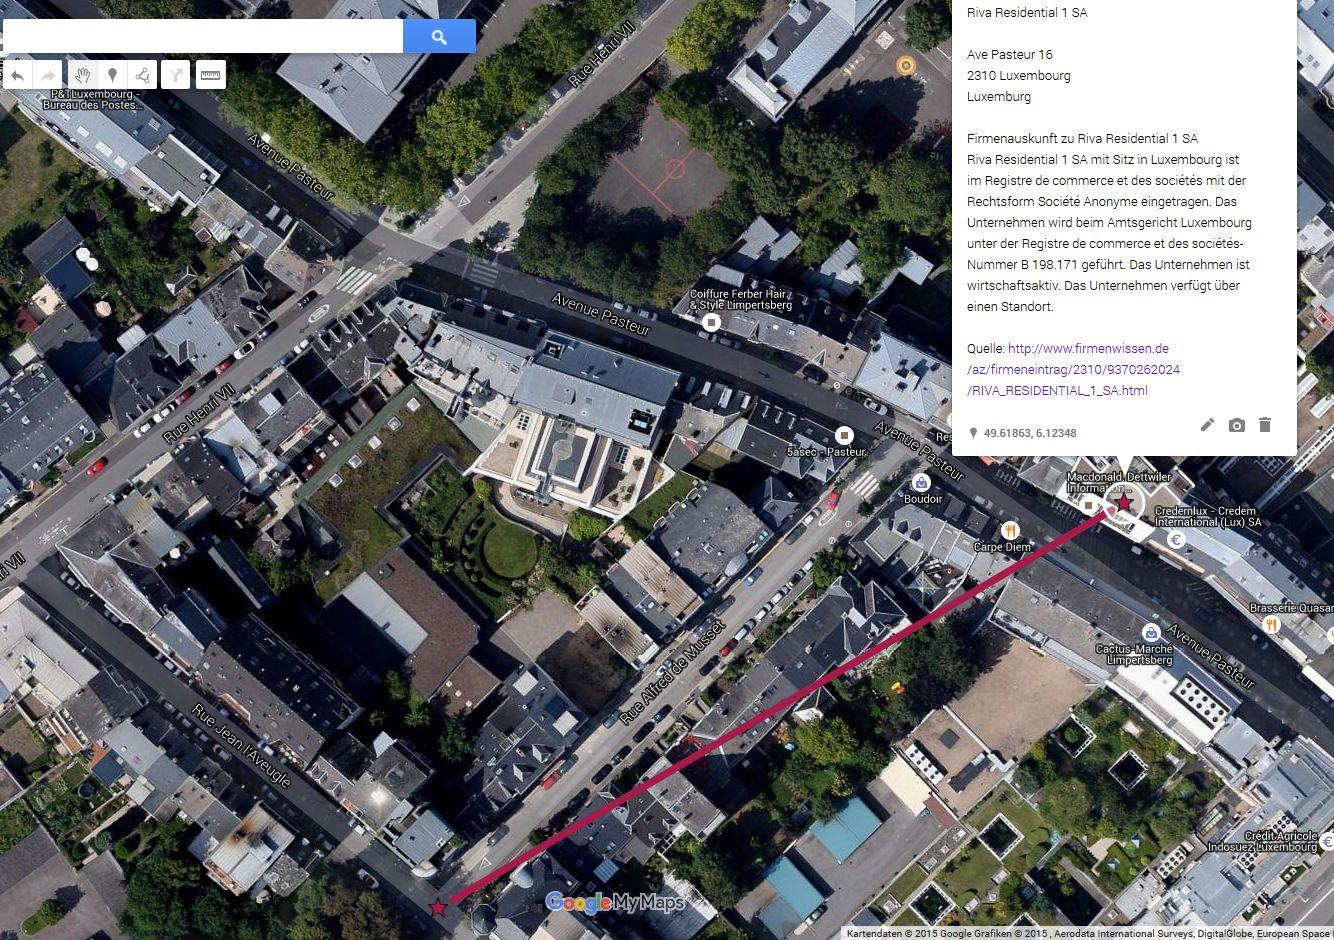 FireShot Screen Capture #054 - 'Karte der Verdrängung in SO36 - map of displacement in SO36 V_02' - www_google_com_maps_d_edit_hl=de&authuser=0&mid=zs